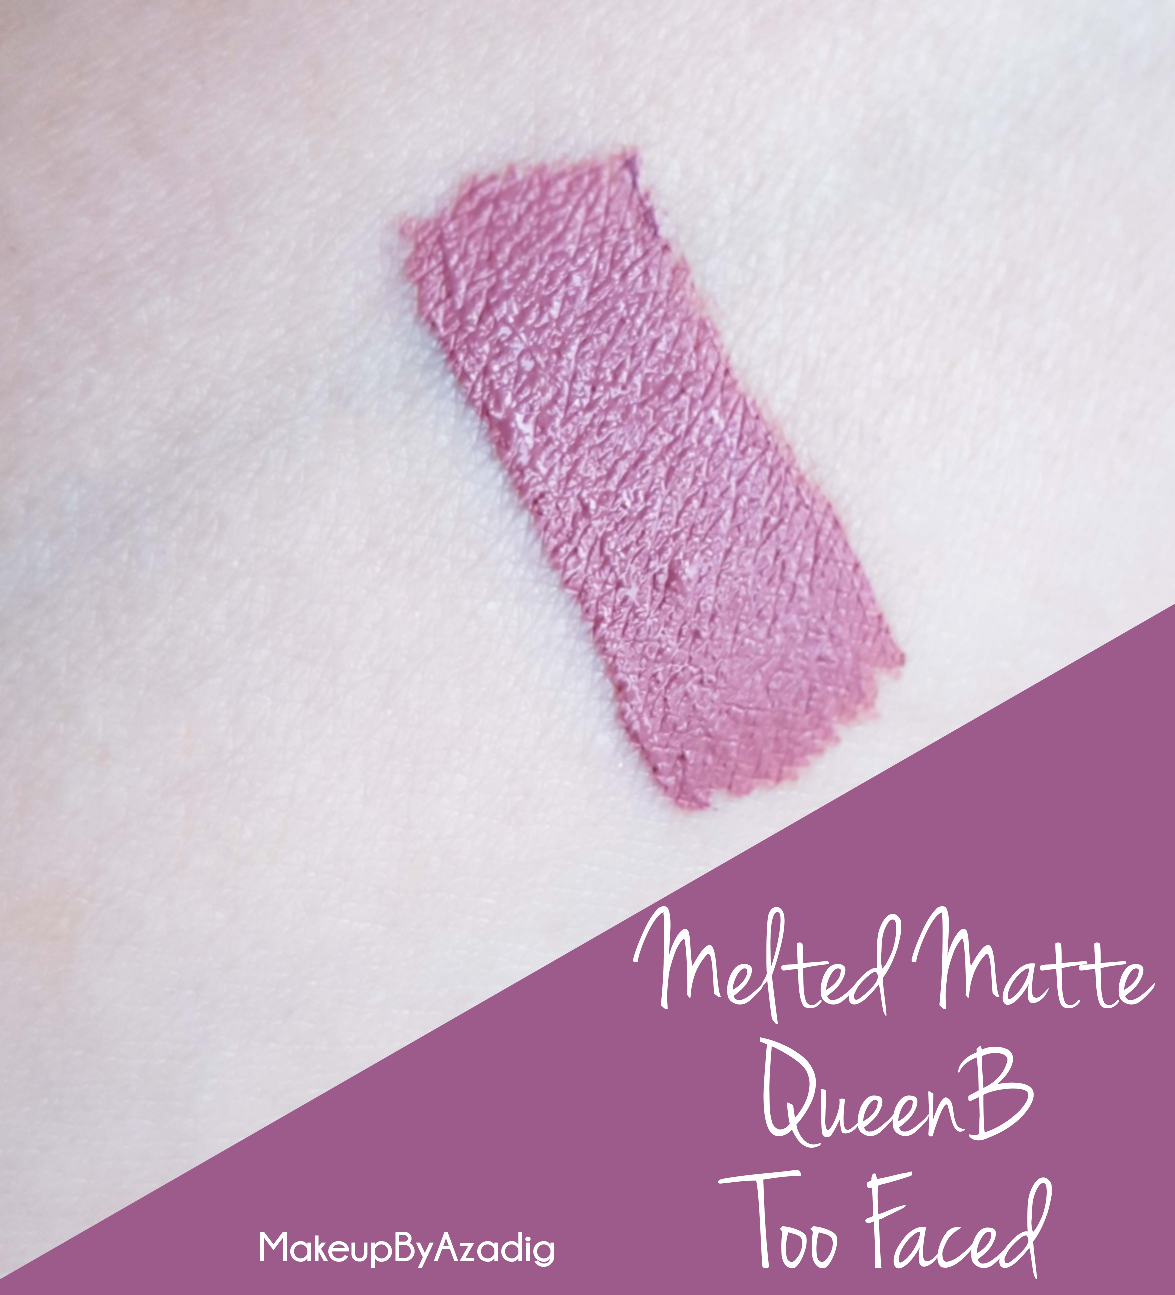 makeupbyazadig-melted-matte-queenb-bendandsnap-dropdeadred-too-faced-rouge-levres-revue-avis-prix-sephora-paris-blog-swatch